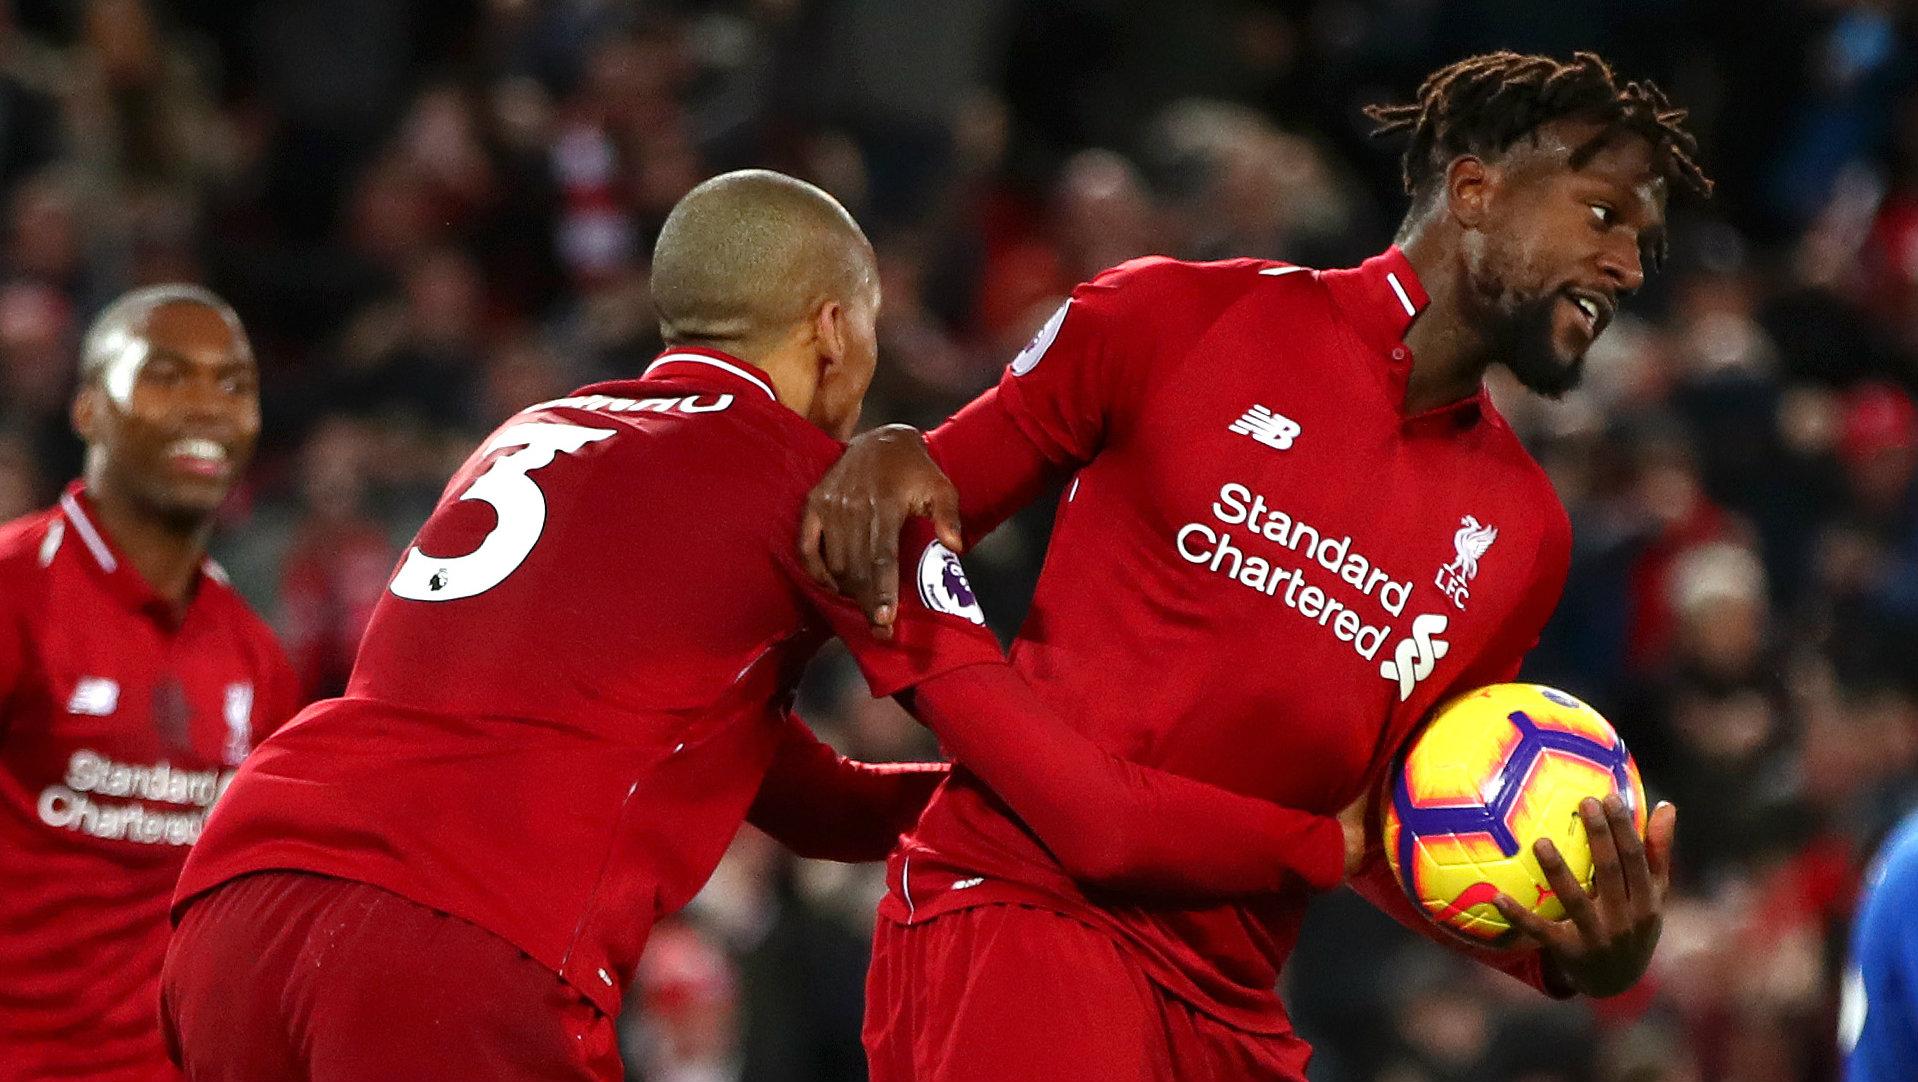 Divock Origi Liverpool vs Everton Premier League 2018-19